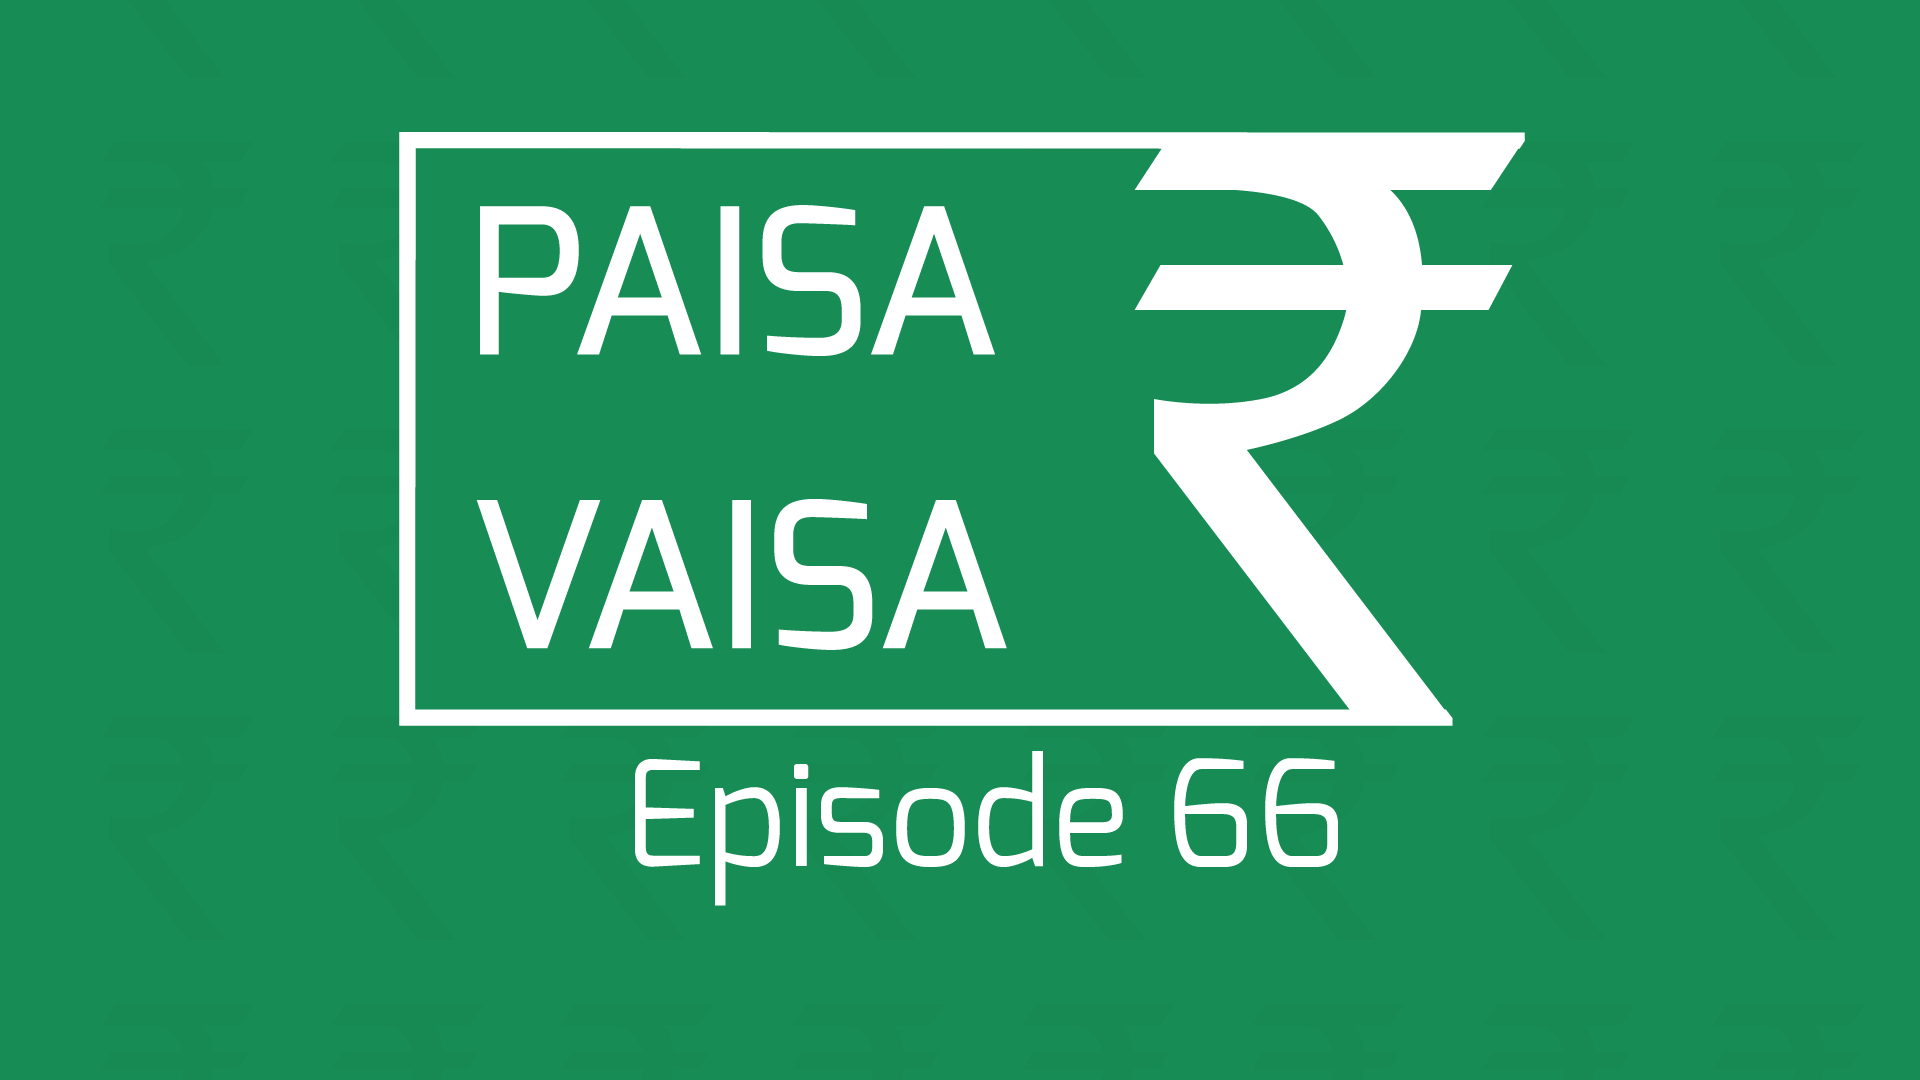 PaisaVaisaEpisode66.png